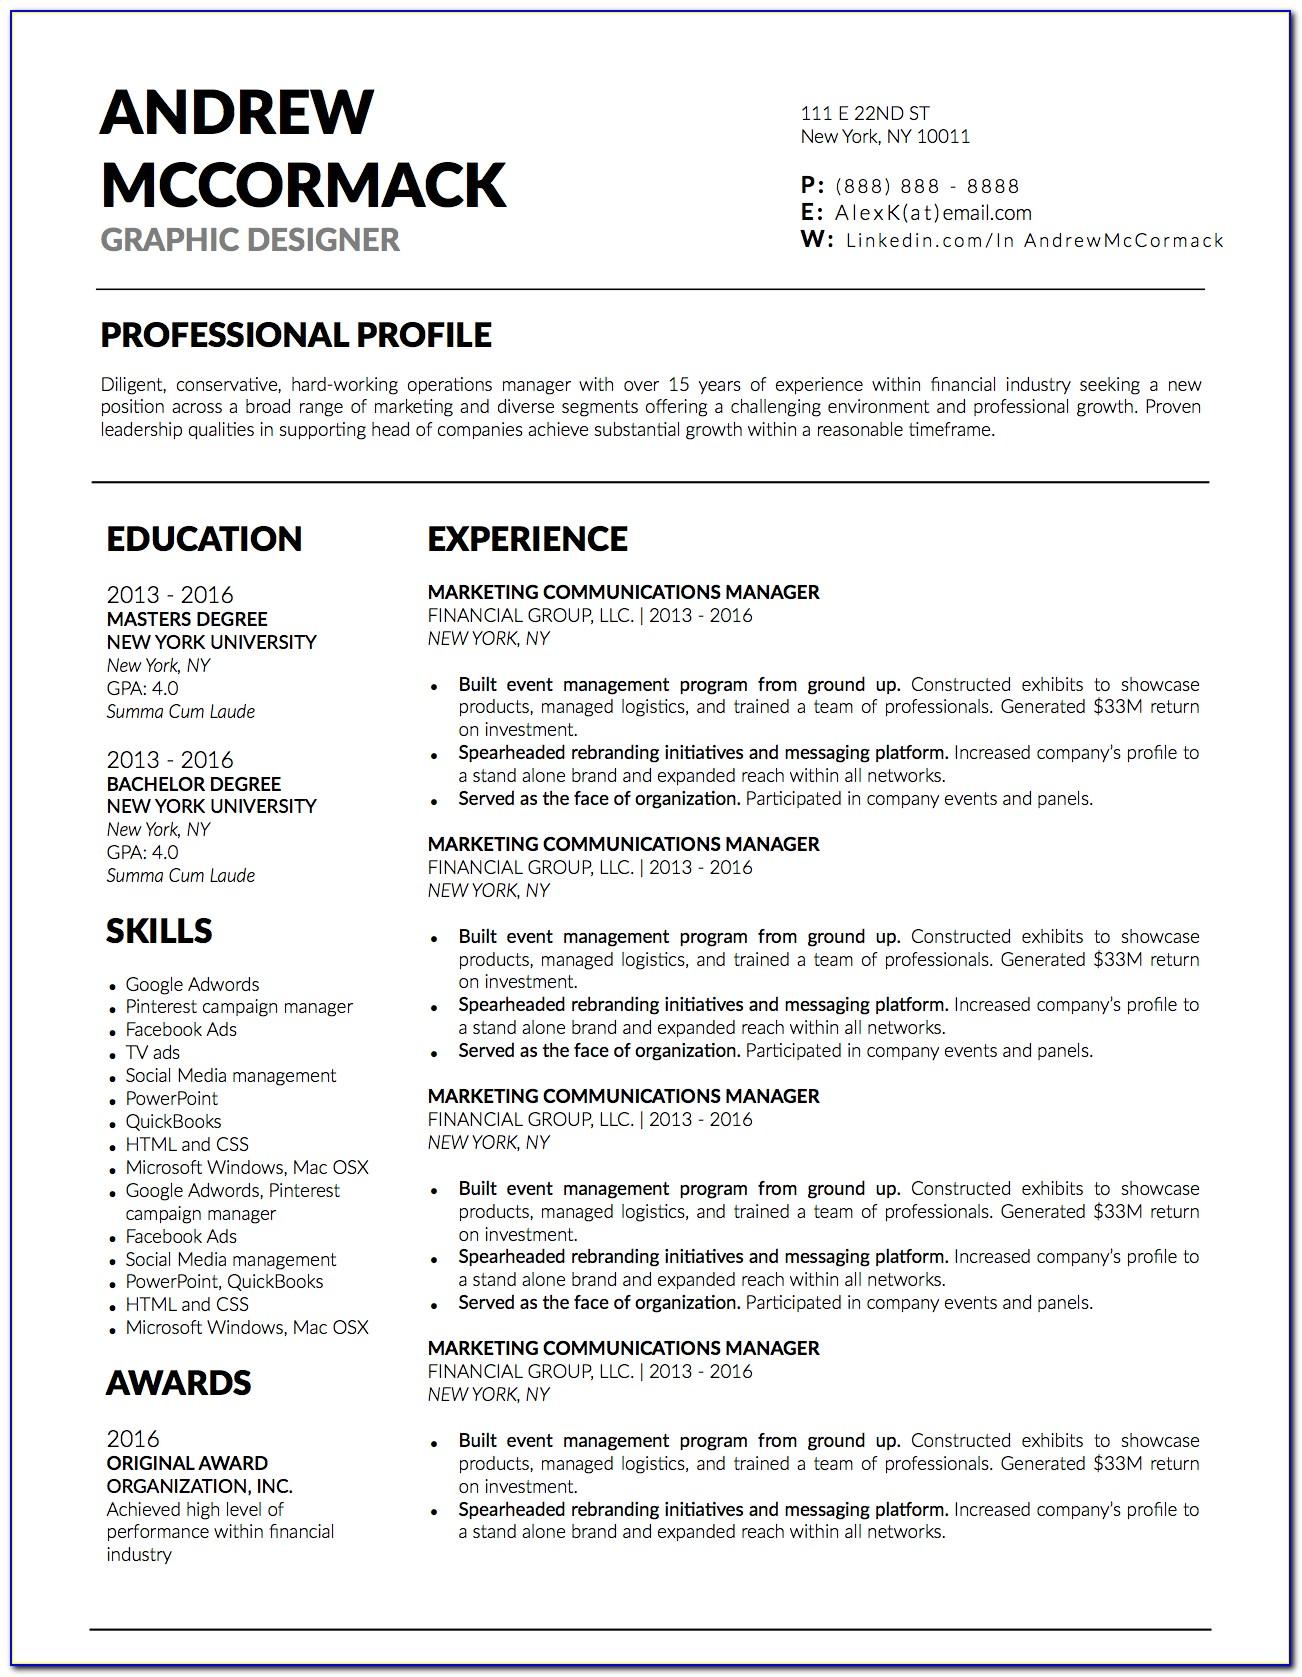 Free Resume Template Adobe Indesign